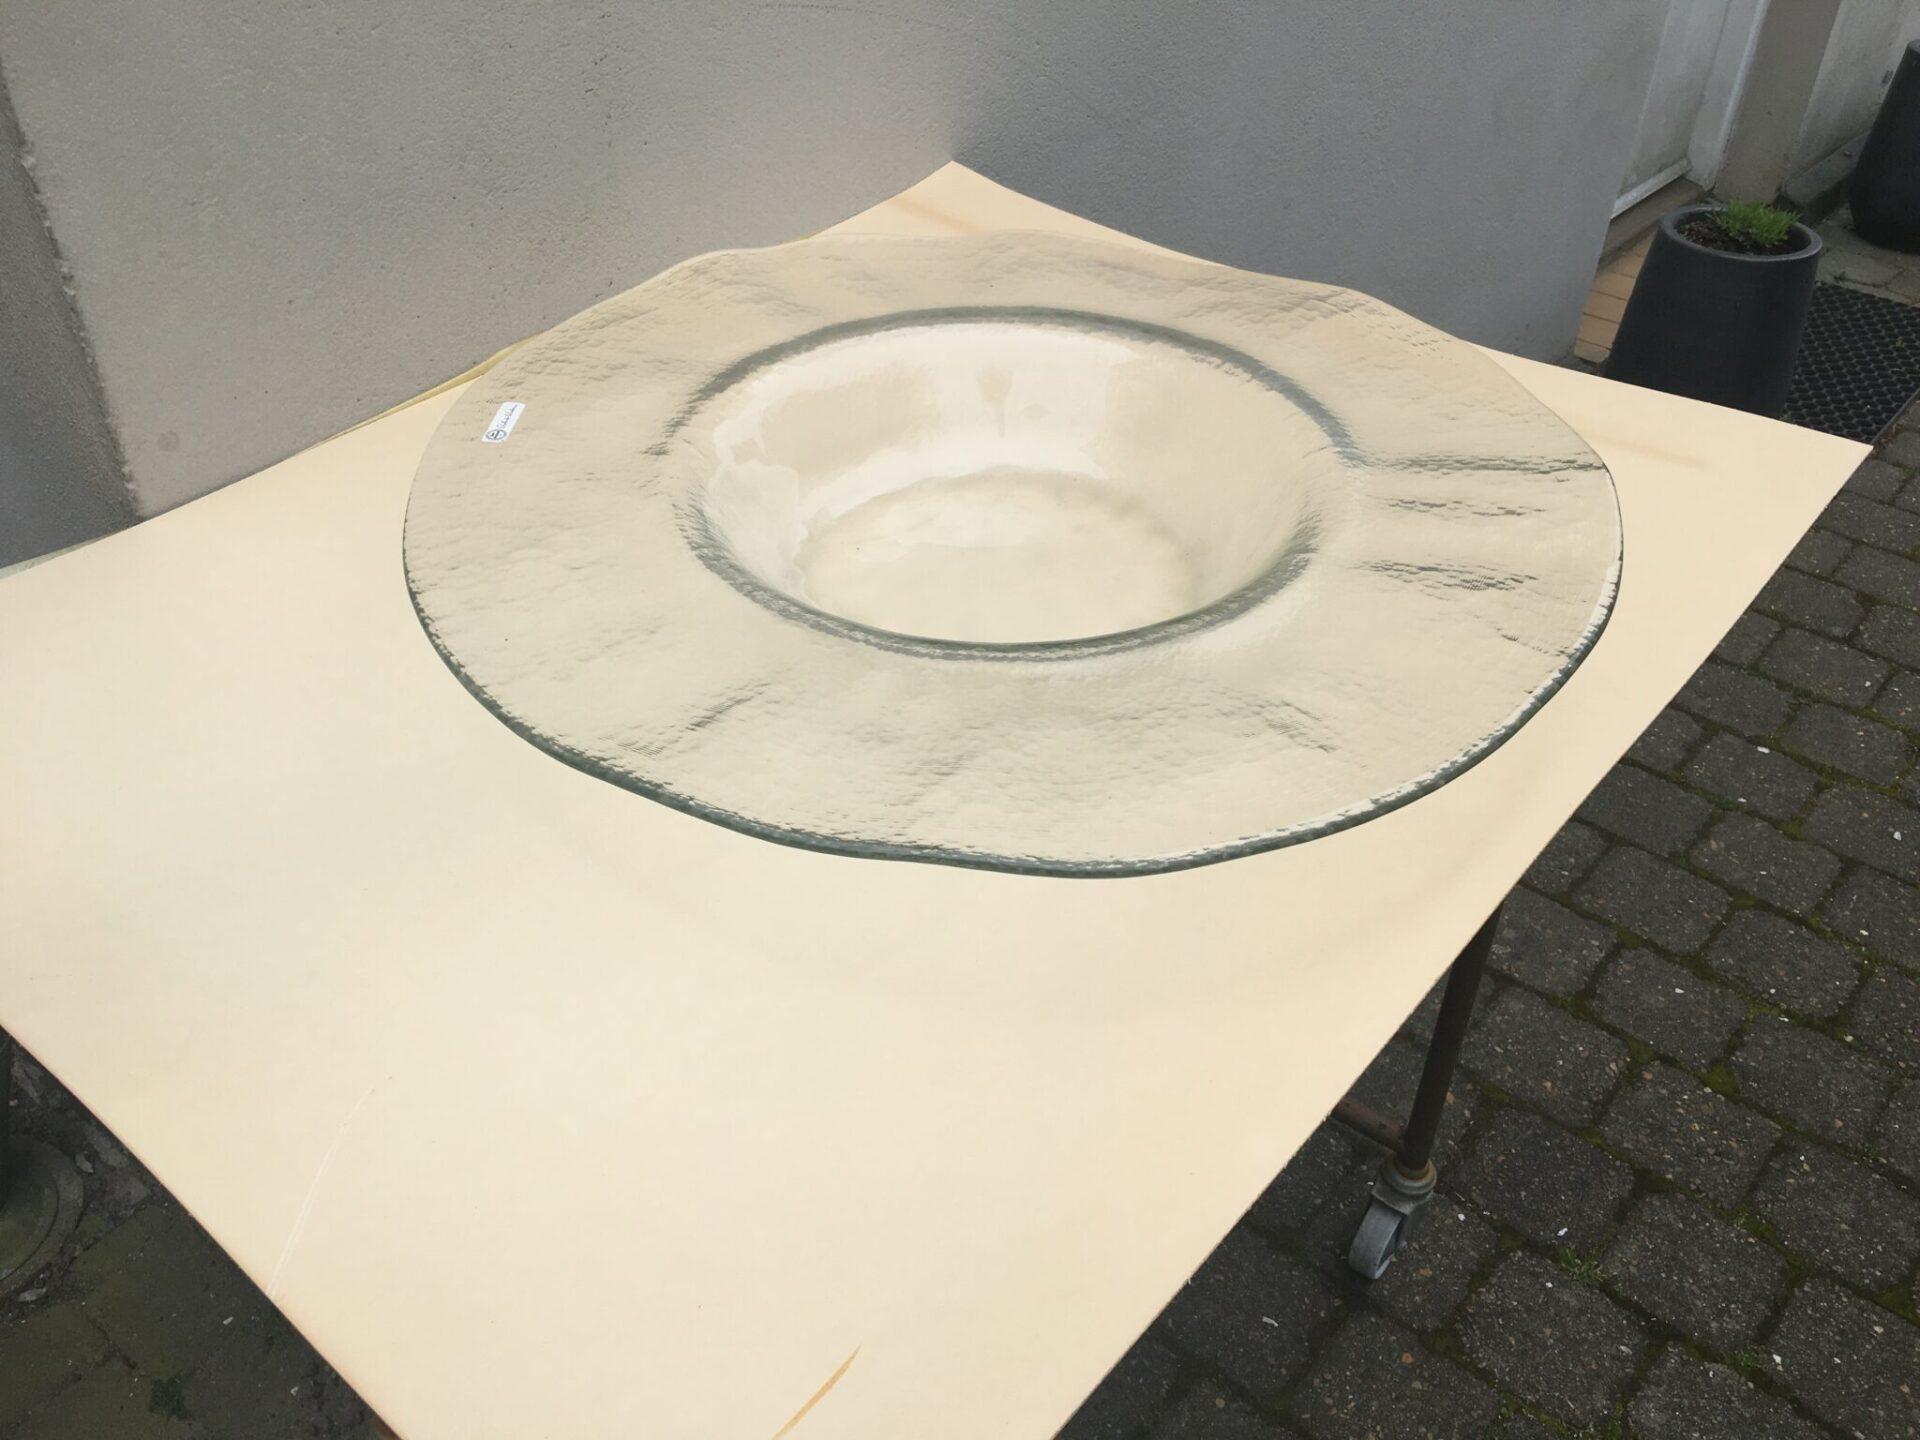 Kæmpe glasfad/bordfad af glas, d = 61 cm, pris 200 kr